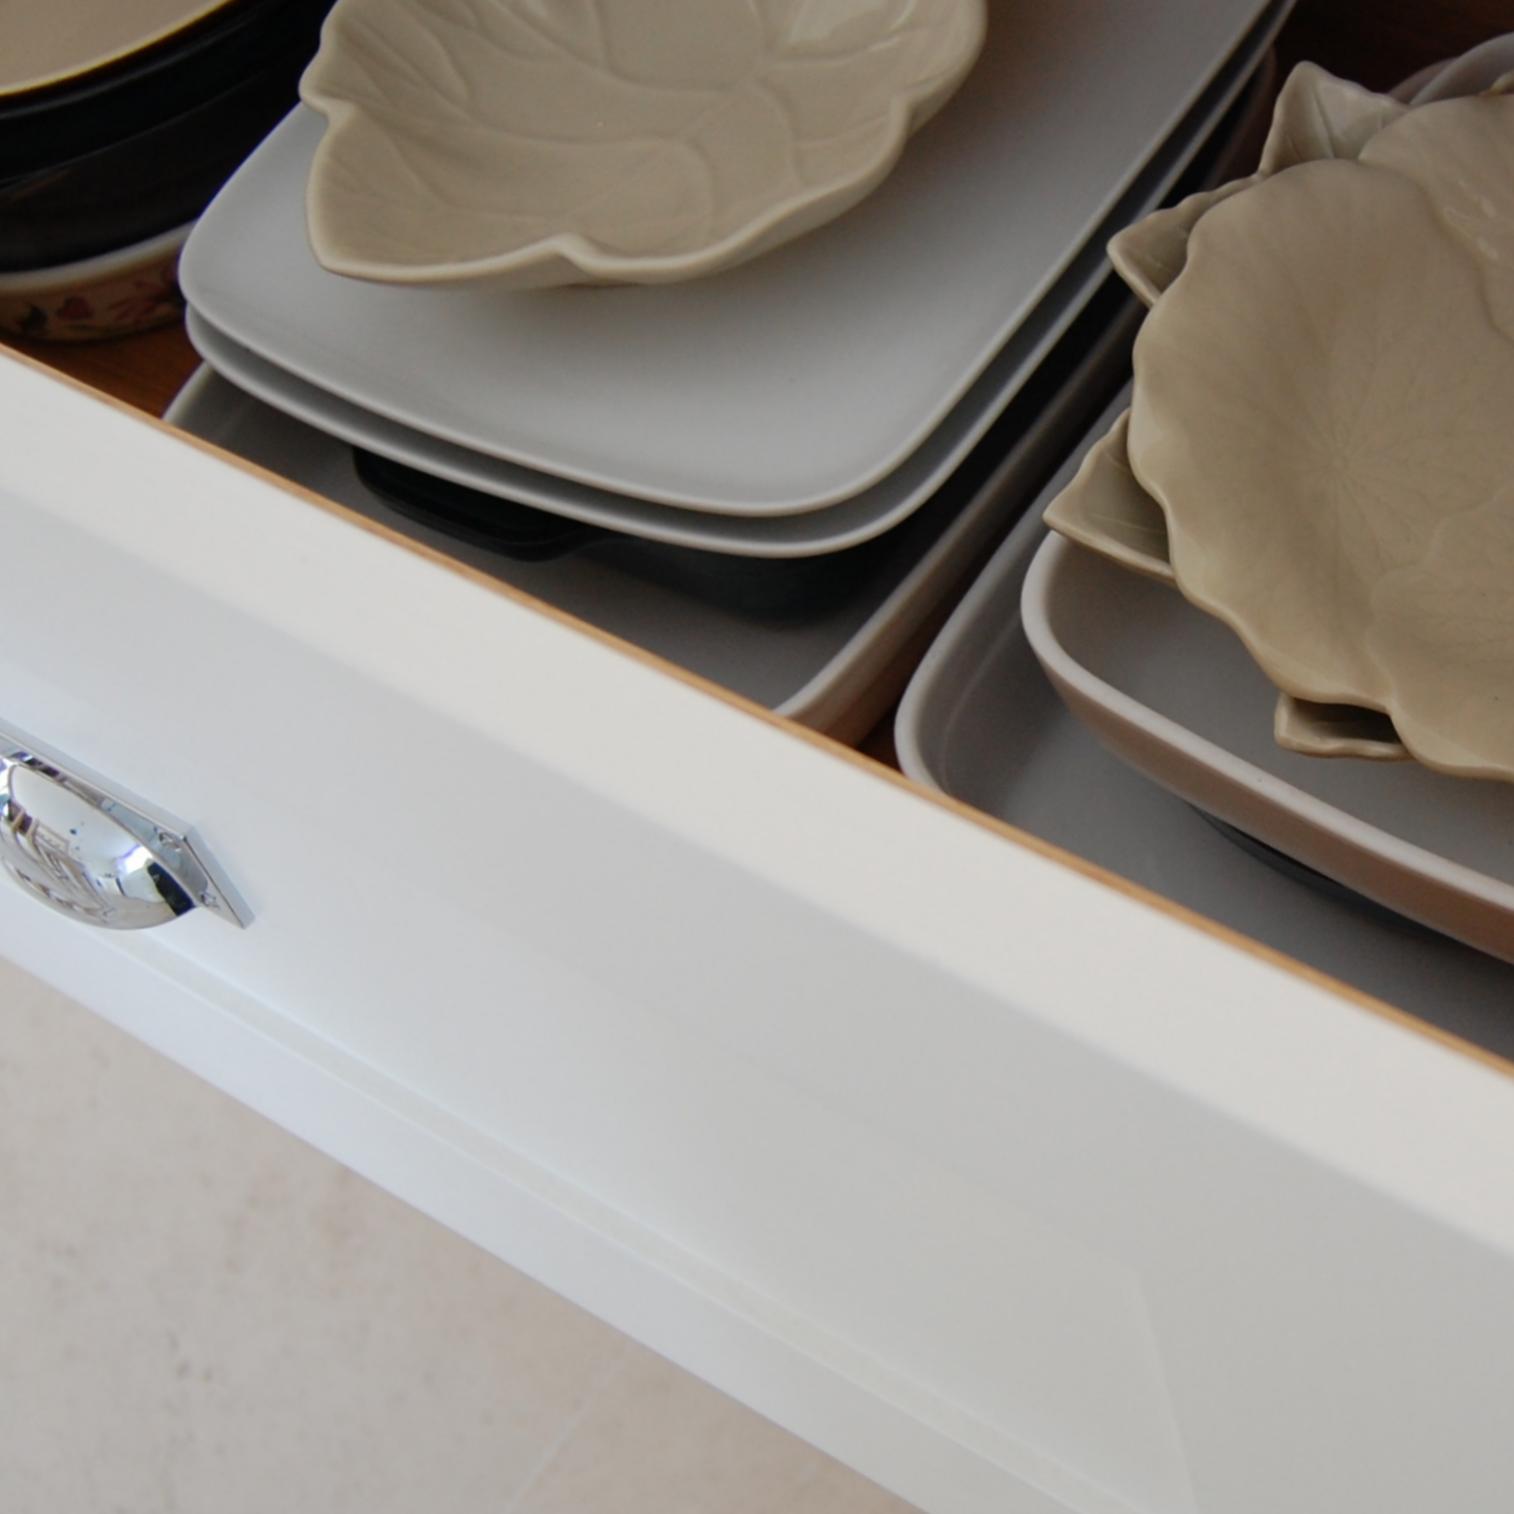 bespoke storage - crockery storage drawers.png